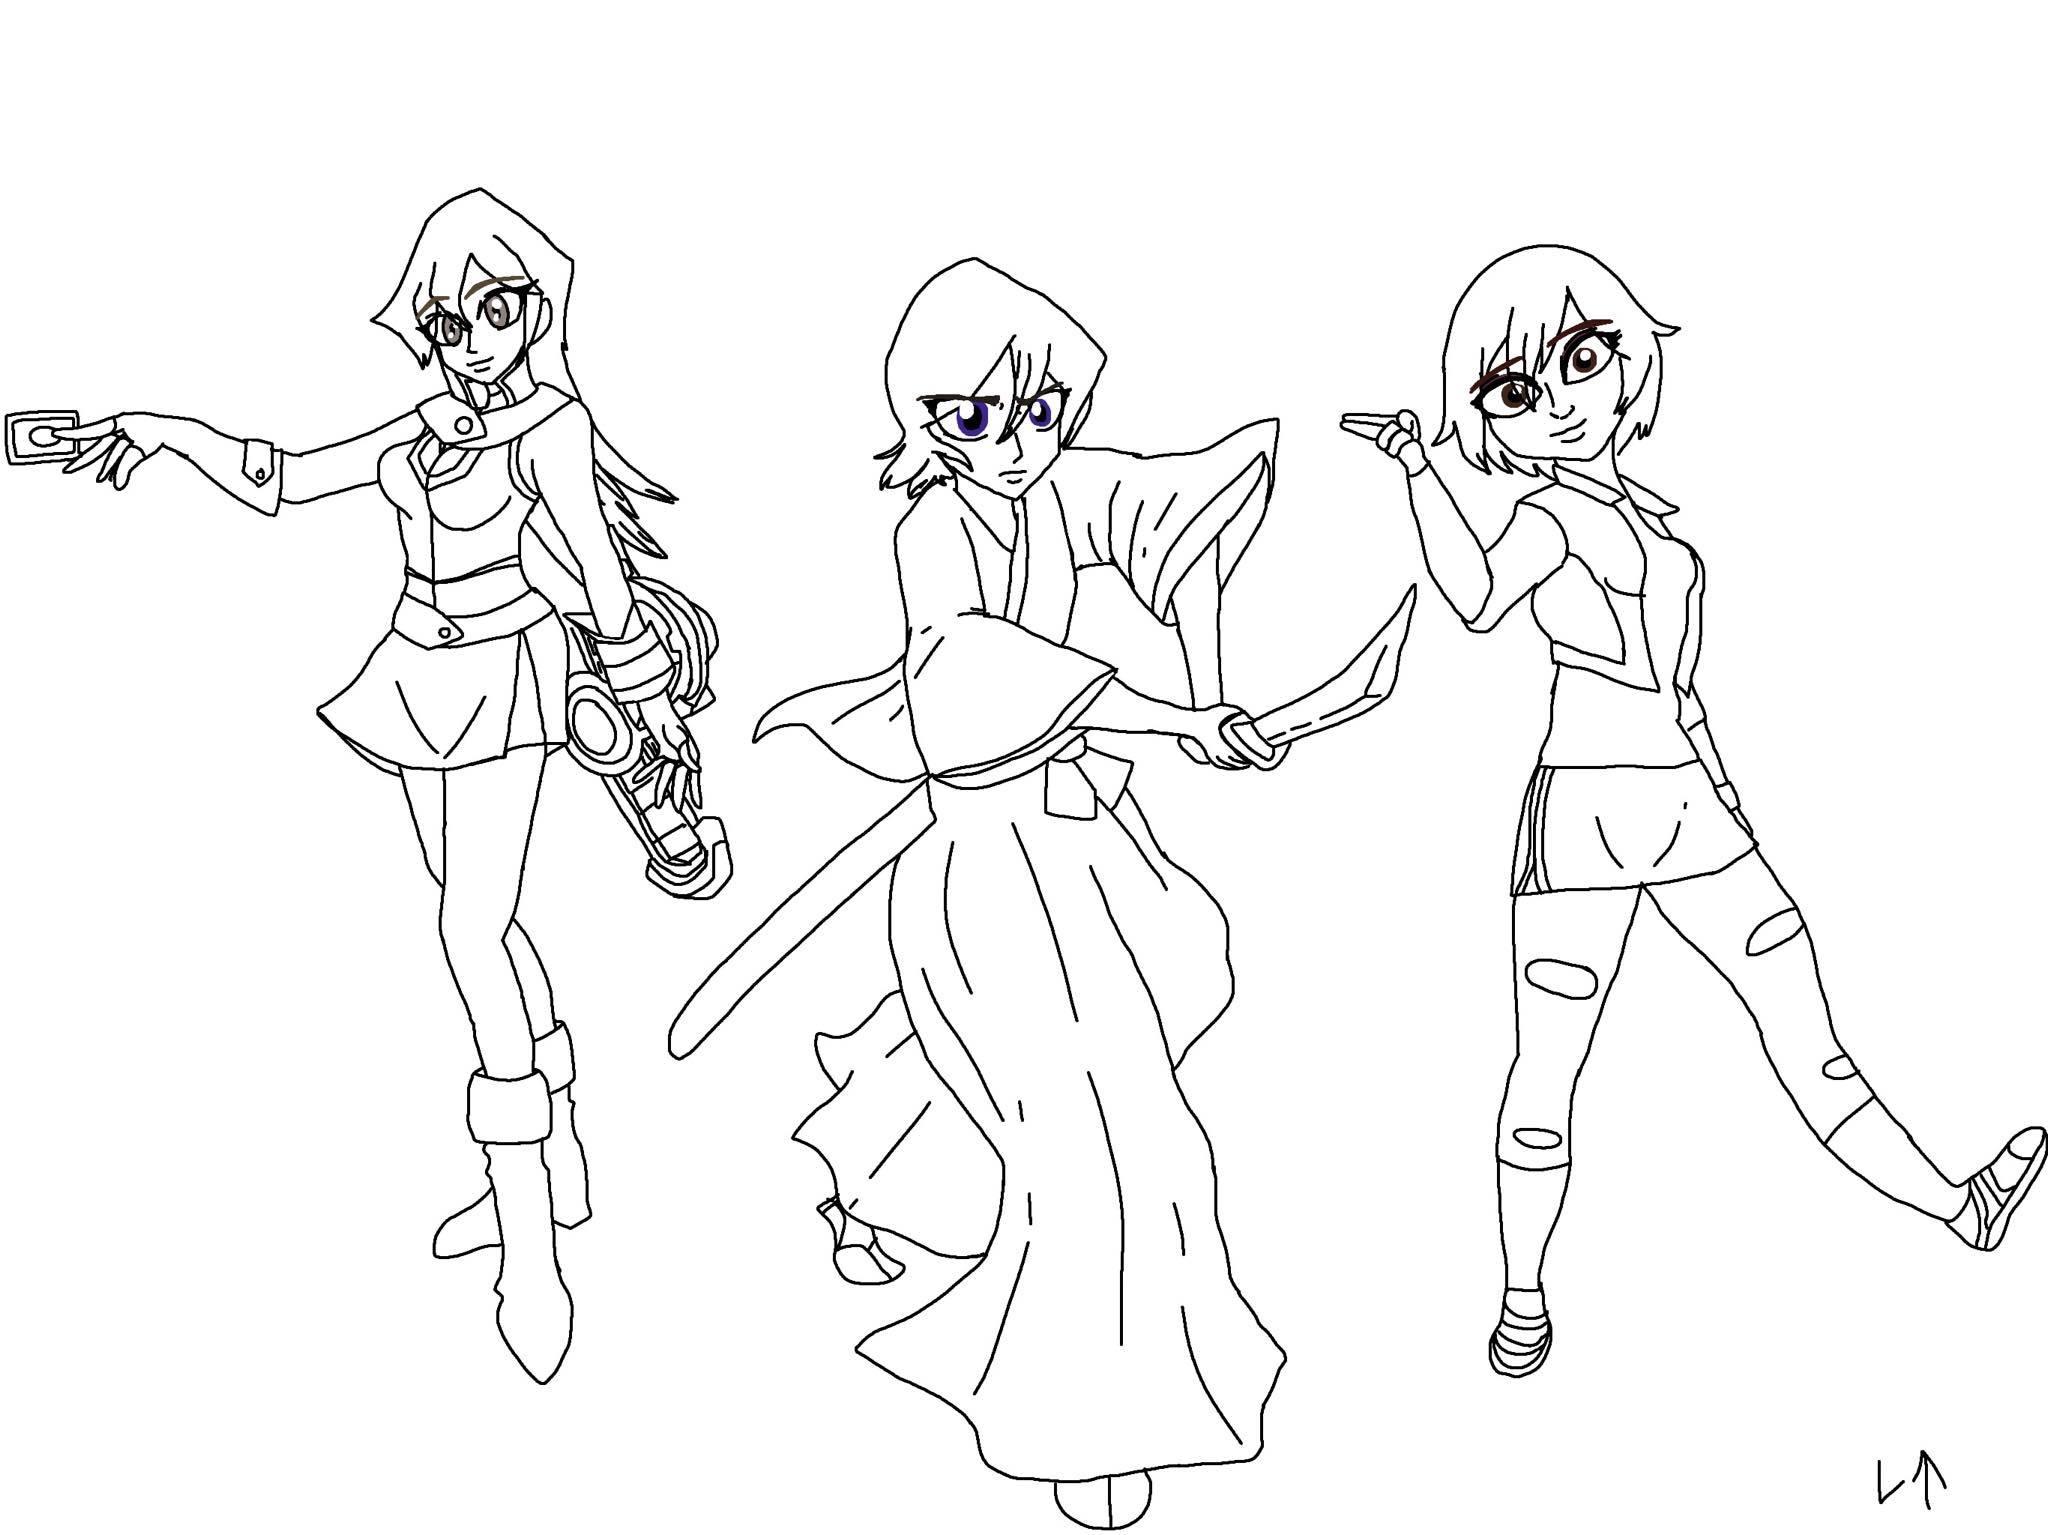 Alexis aka Asuka,Rukia and Gogo by Rainbow-Dash-Rockz